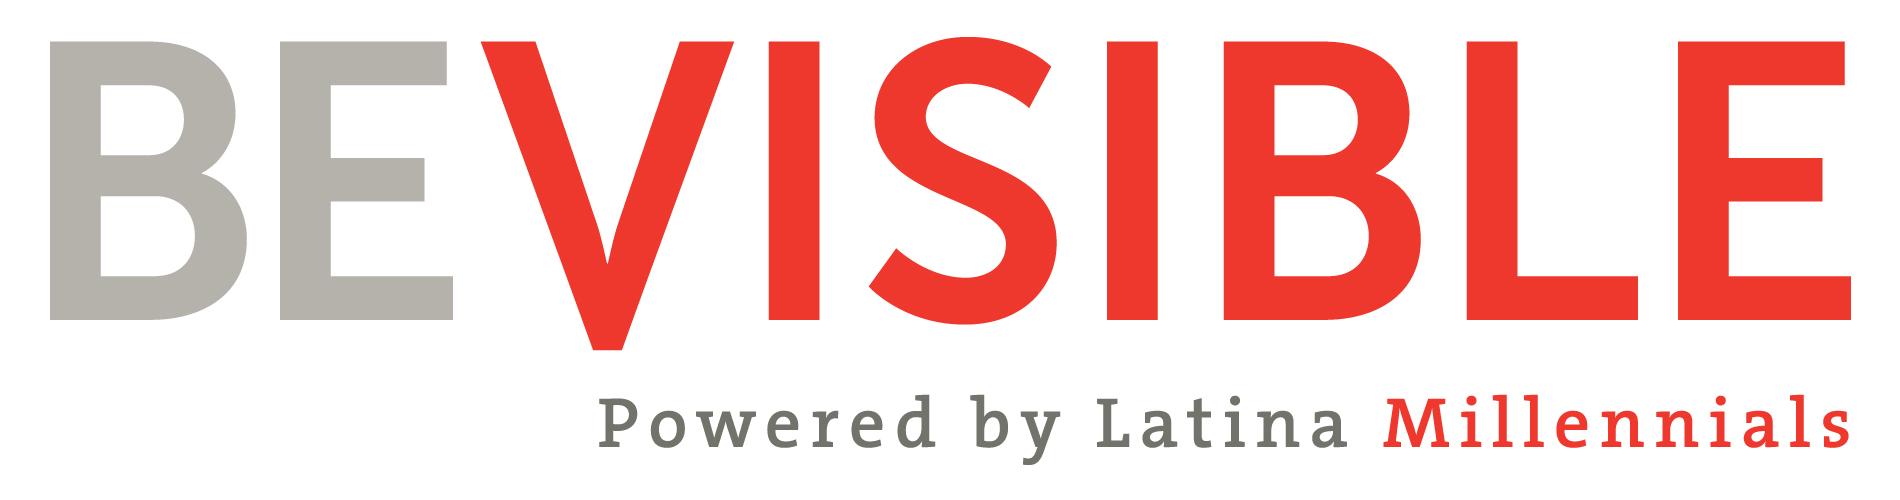 BeVisible_Logo.jpg